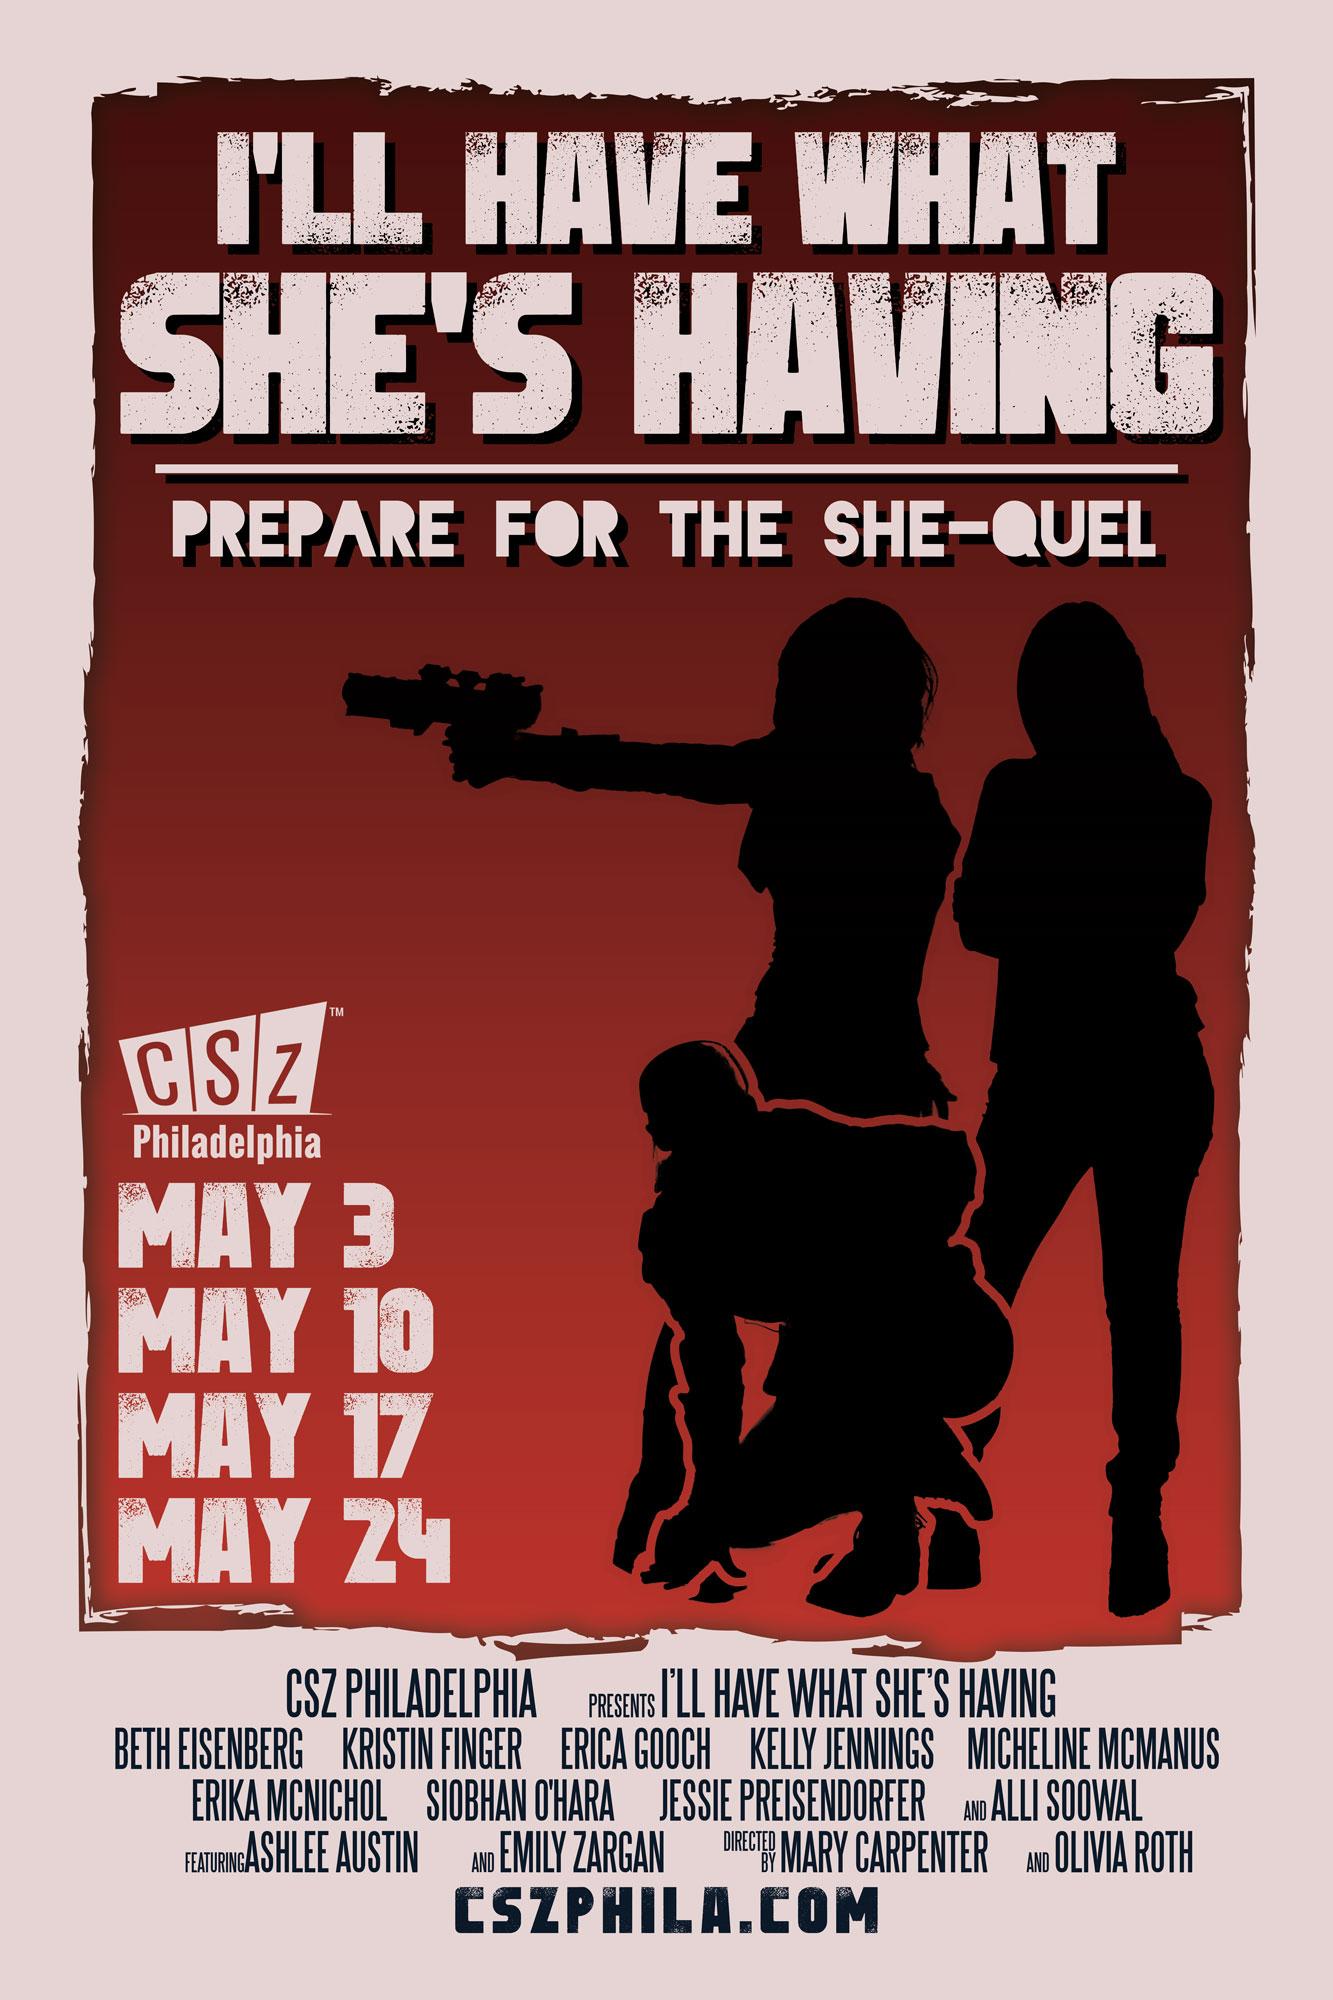 IHWSH Poster (vertical) by Shaun Kreider